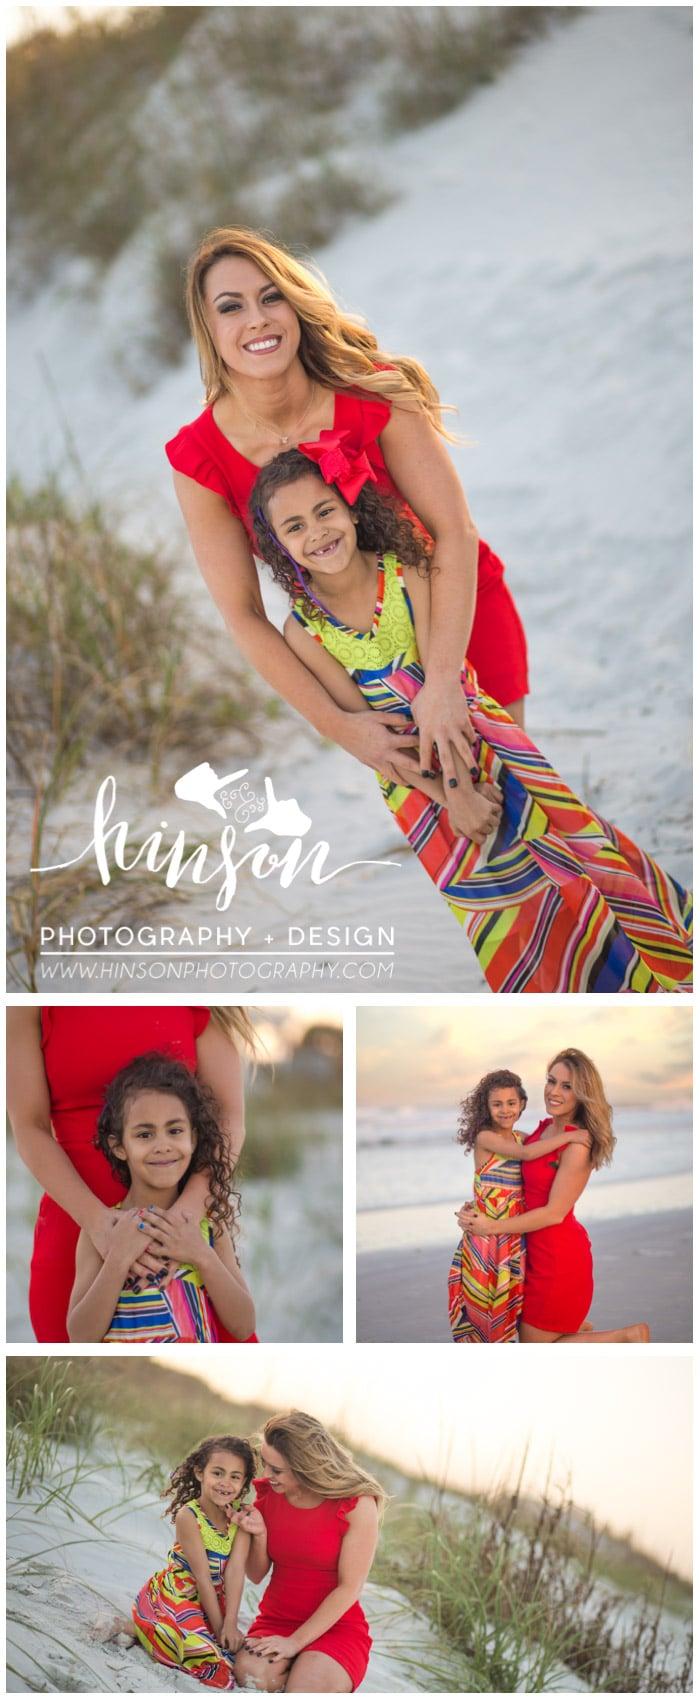 graphs session, Daytona beach photographer, family beach session, disney vacation, disney photography session, orlando vacation, orlando photographer, orlando beach photographer